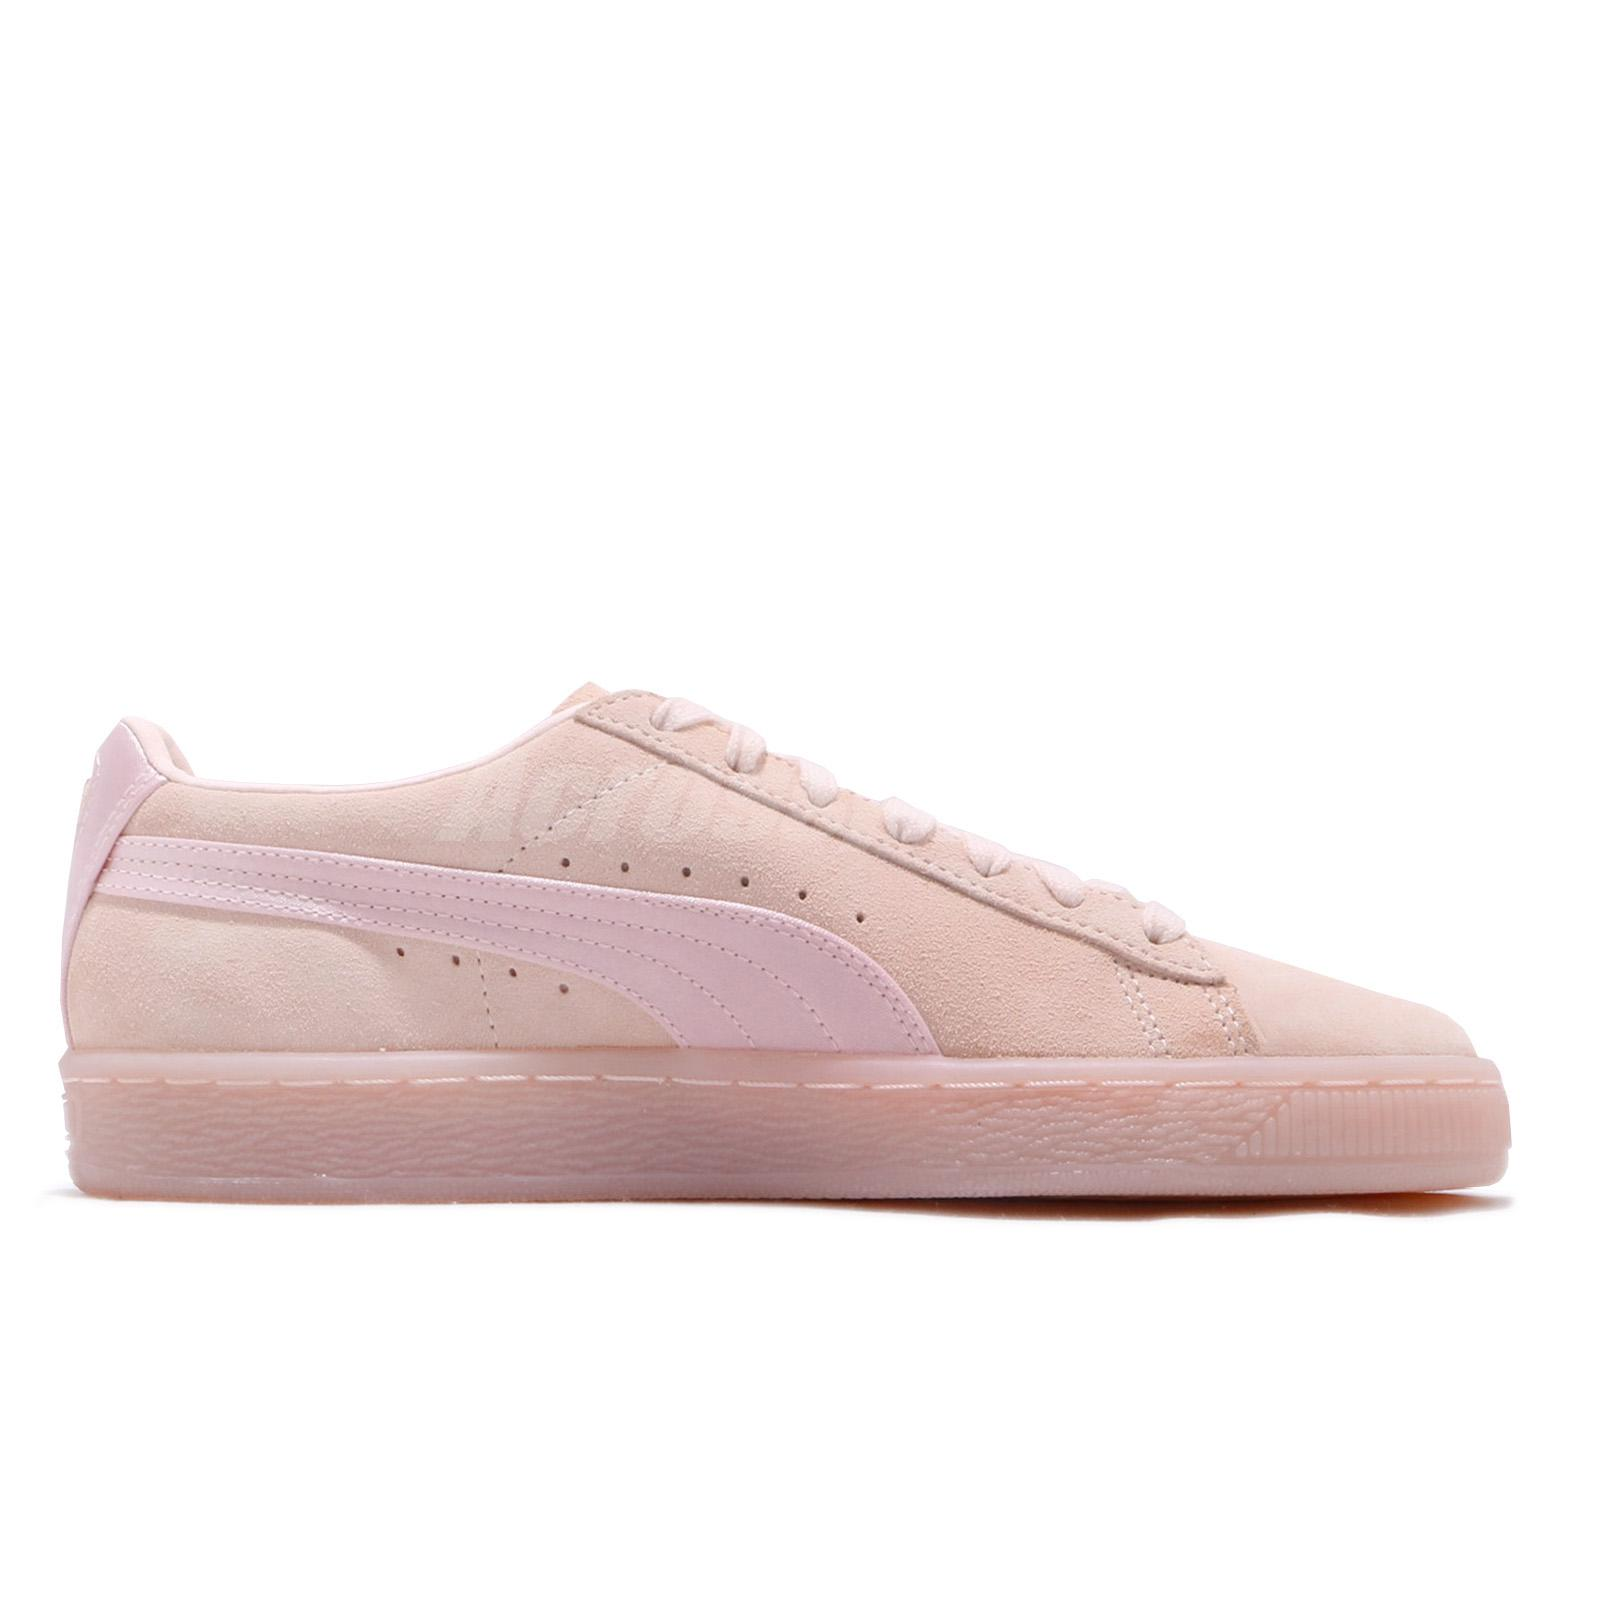 Wns Puma Rose Satin Gold Shoe Casual Suede Women Classic Pearl TFKcl1J